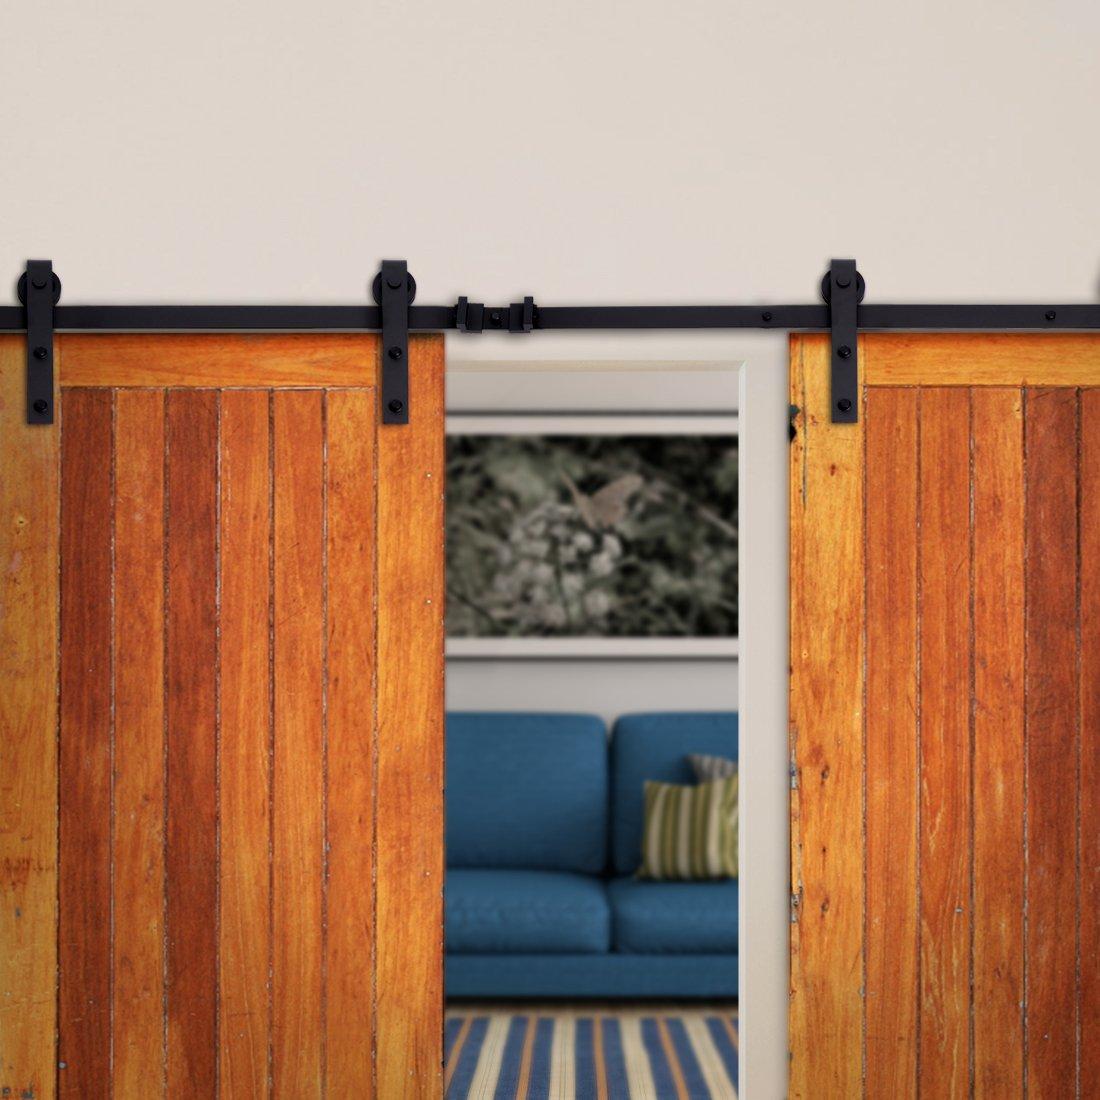 GOOD LIFE 12 FT Sliding Barn Door Hardware Track System Kit Double Wood Door Sliding Interior DIY Wall Mount Guide Set Dark Coffee Antique Style HMI067